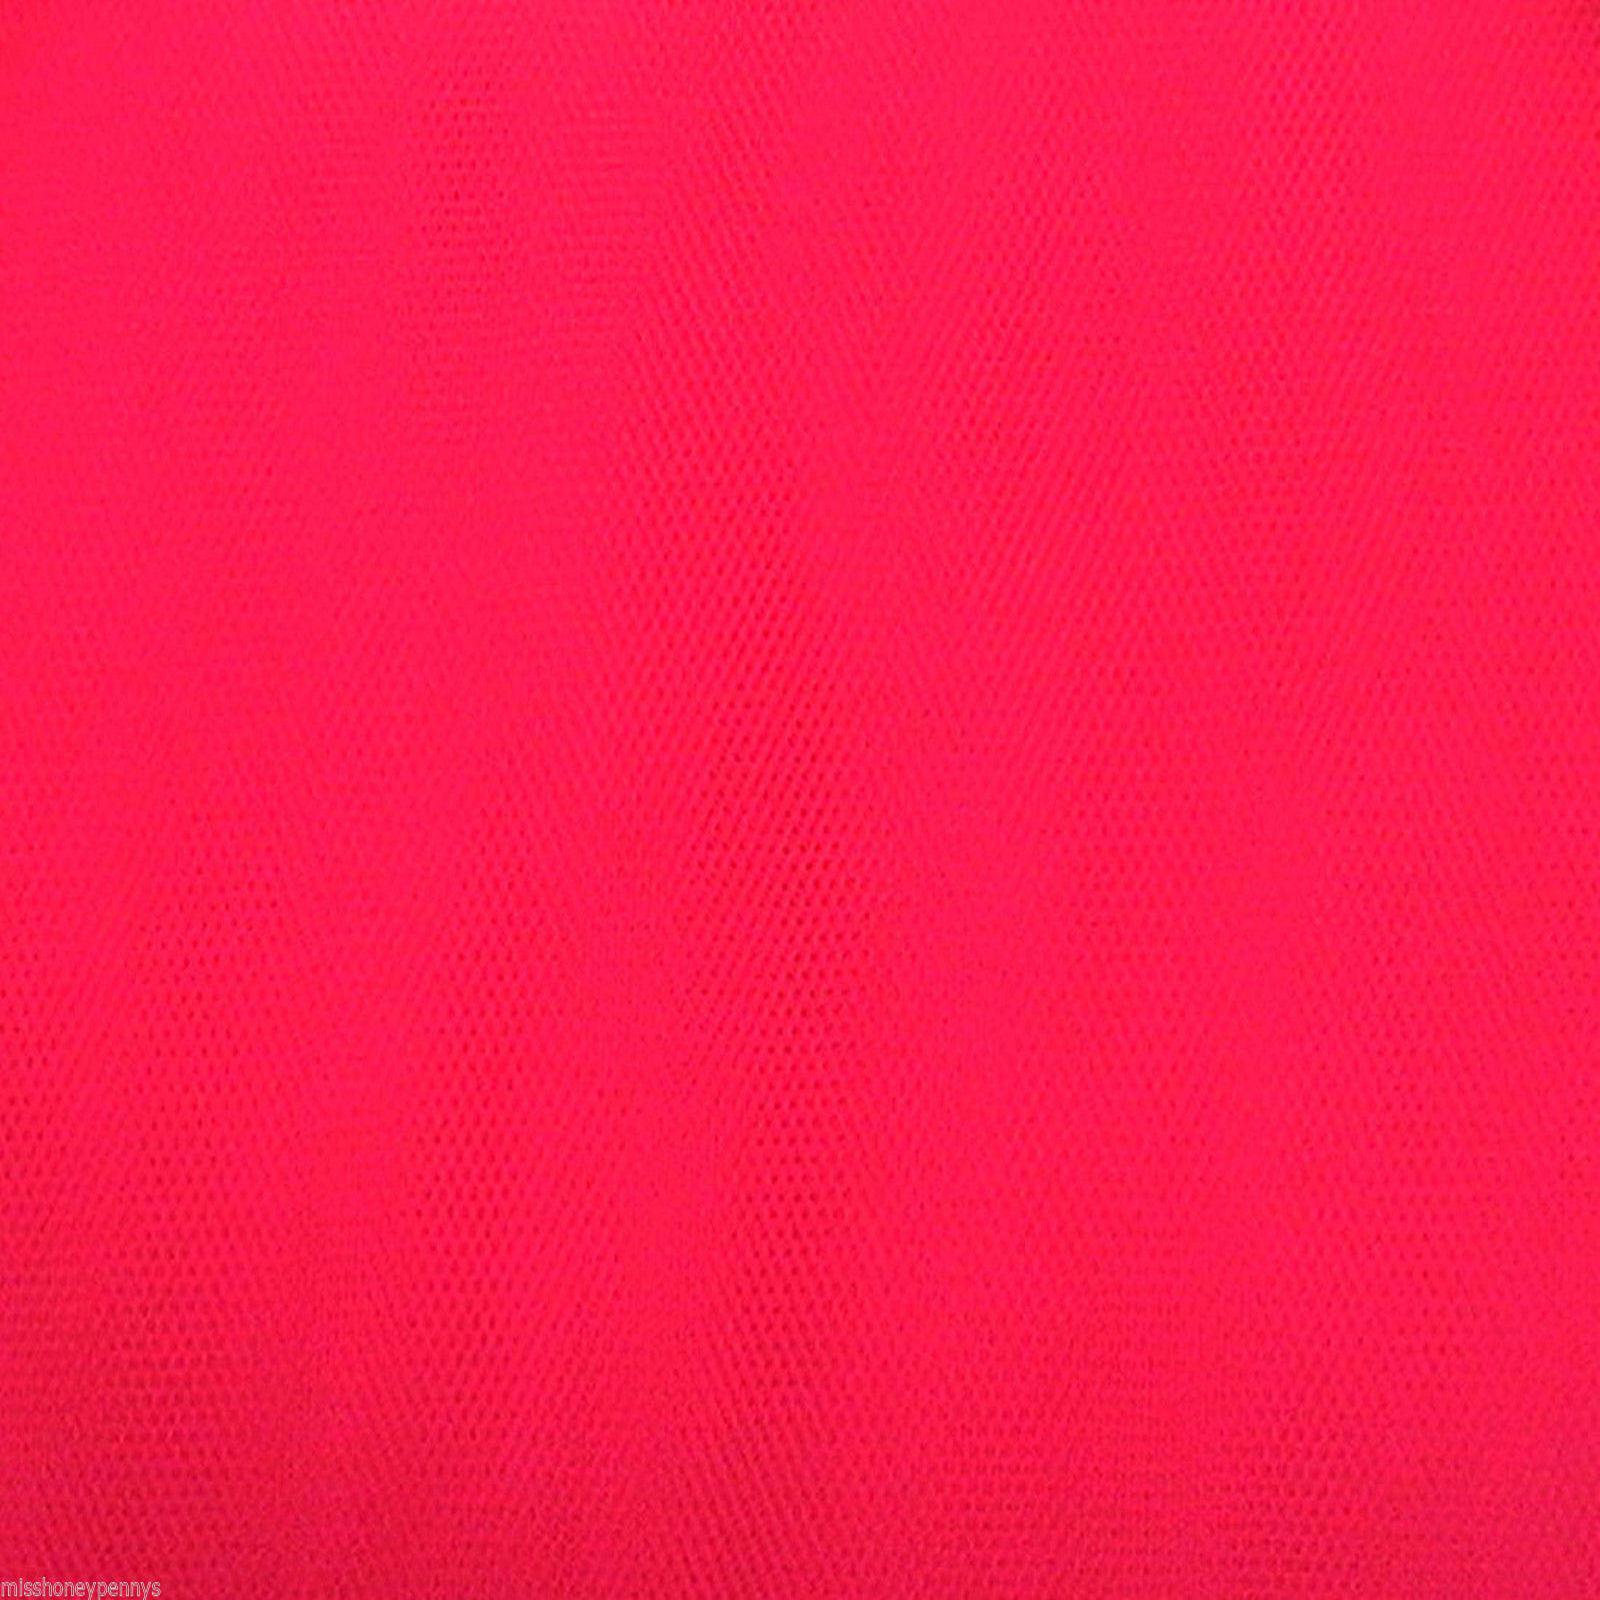 Neon Cerise Pink Tutu 80s Fancy Dress Net Tulle Fabric